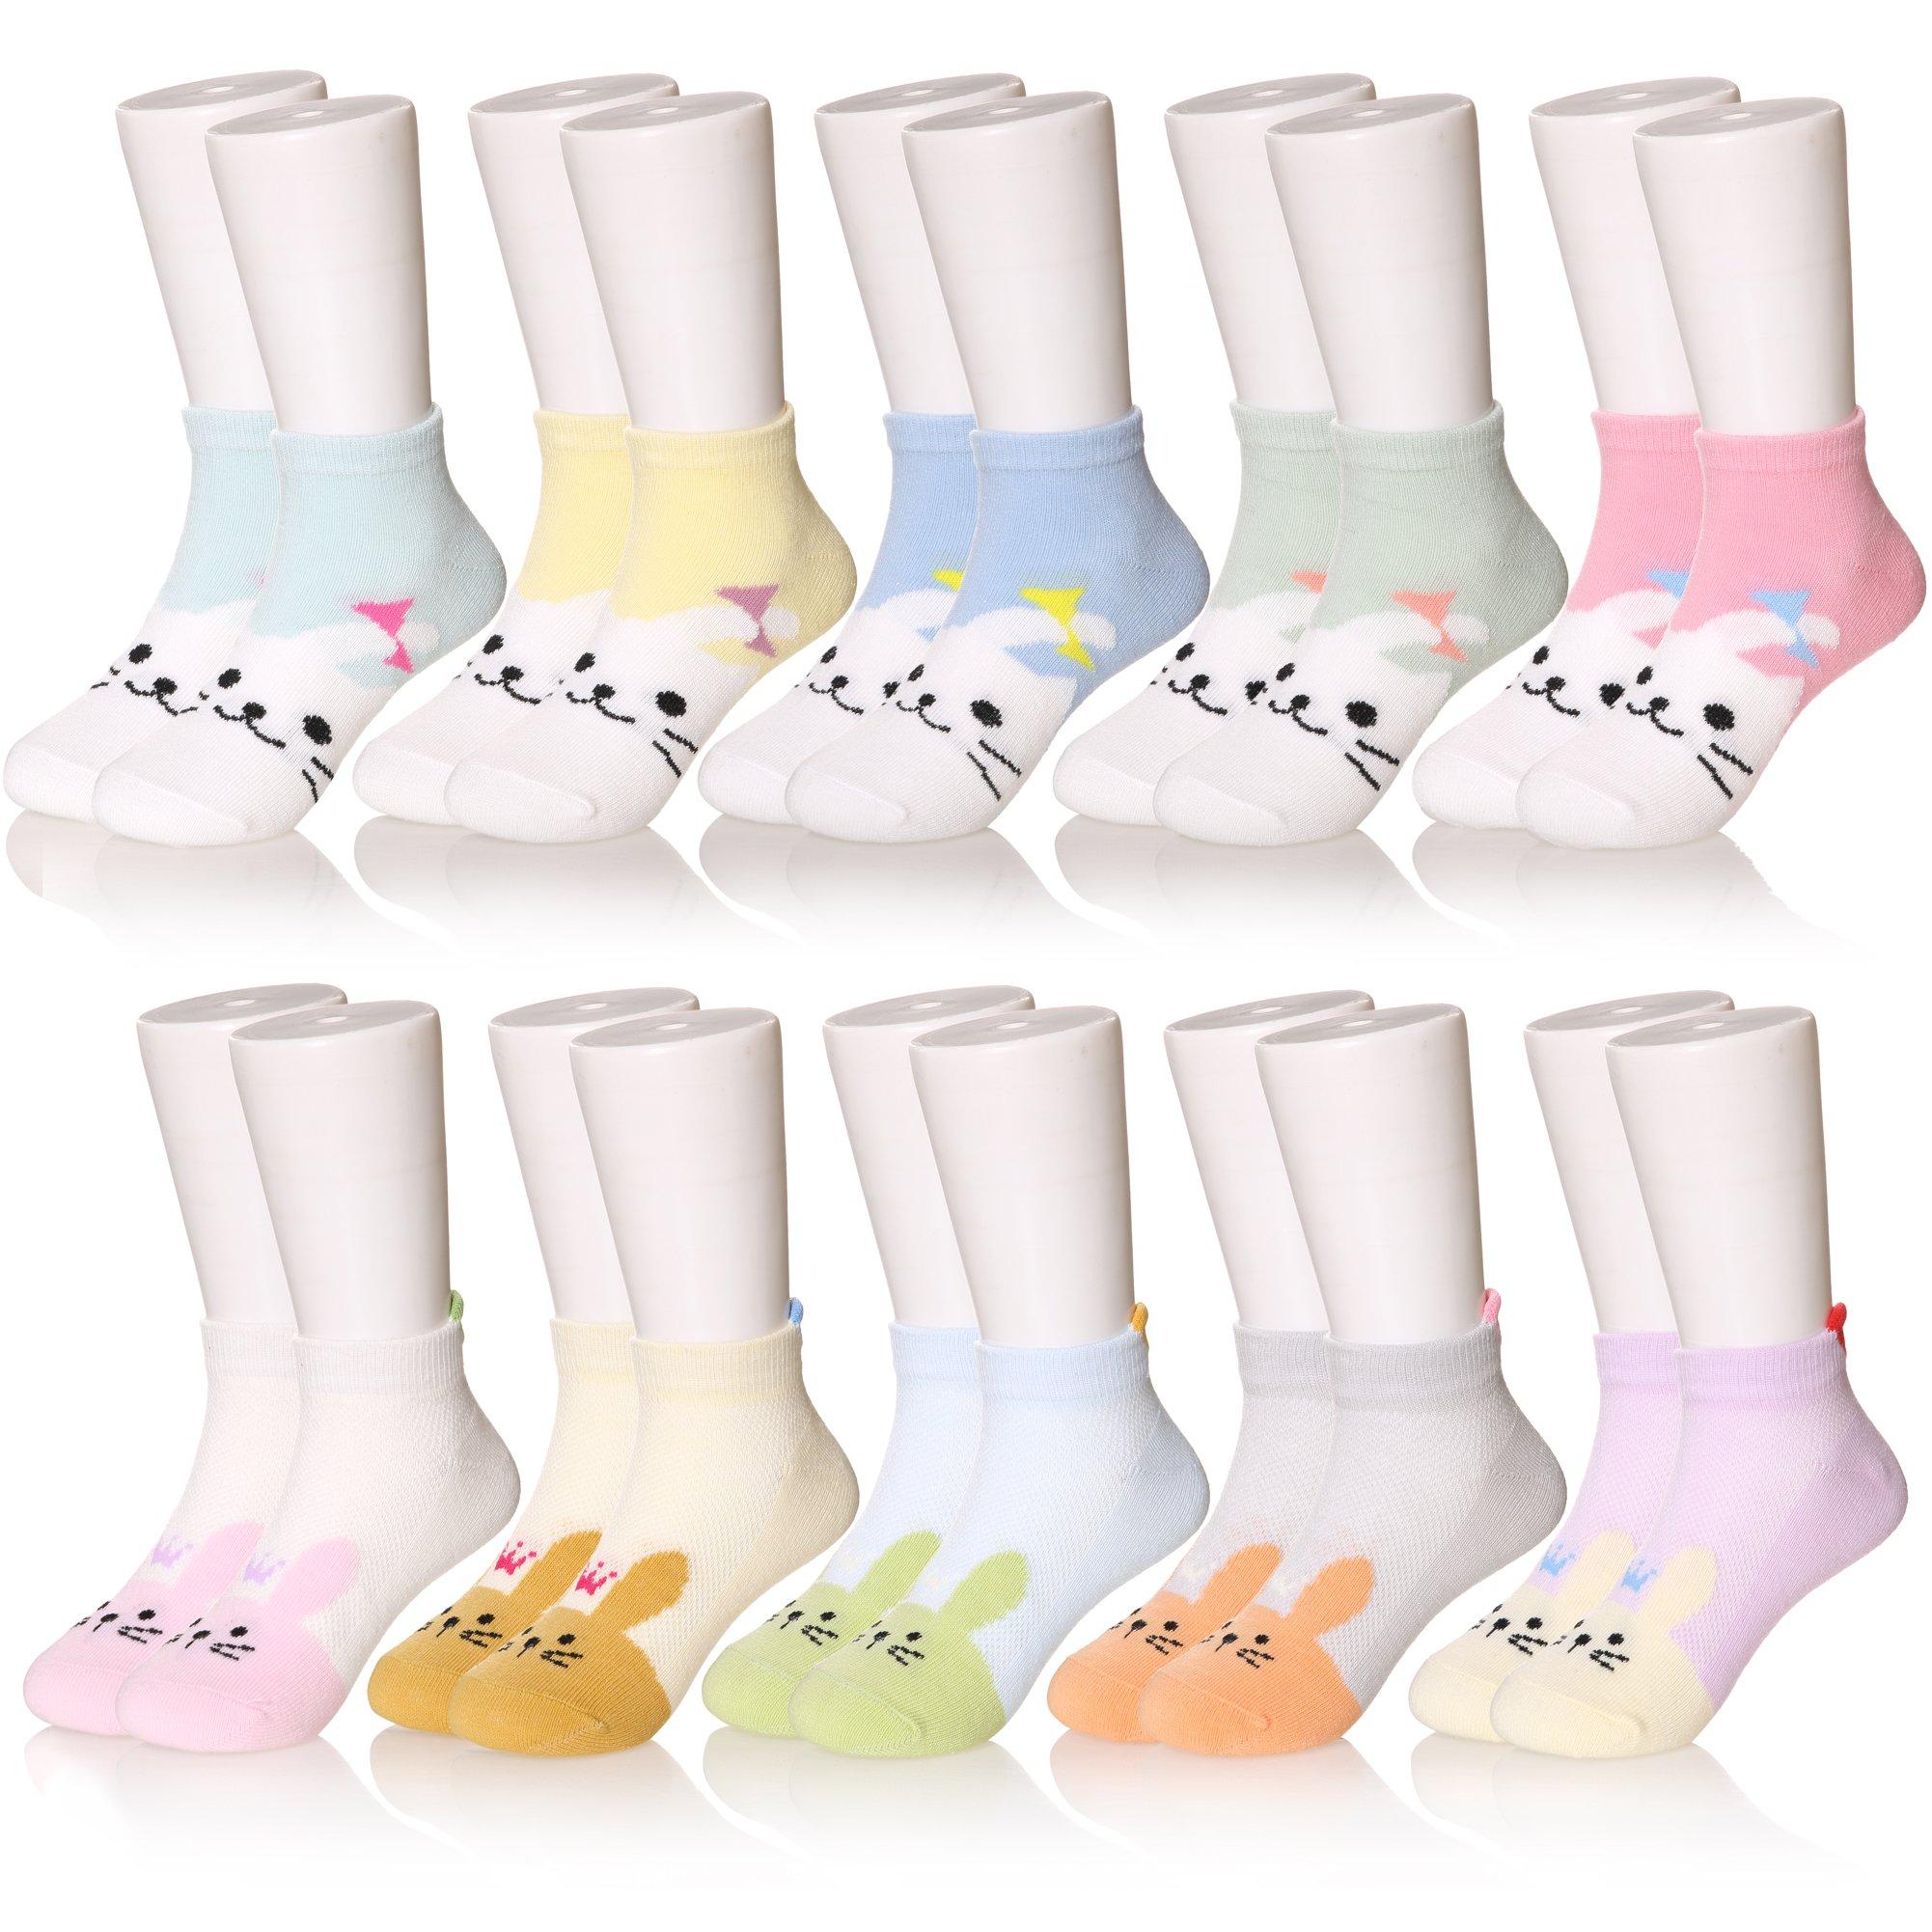 10 Pairs Boys' Low Cut Athletic Socks (Girls 10 Pairs, 8-12 Years)